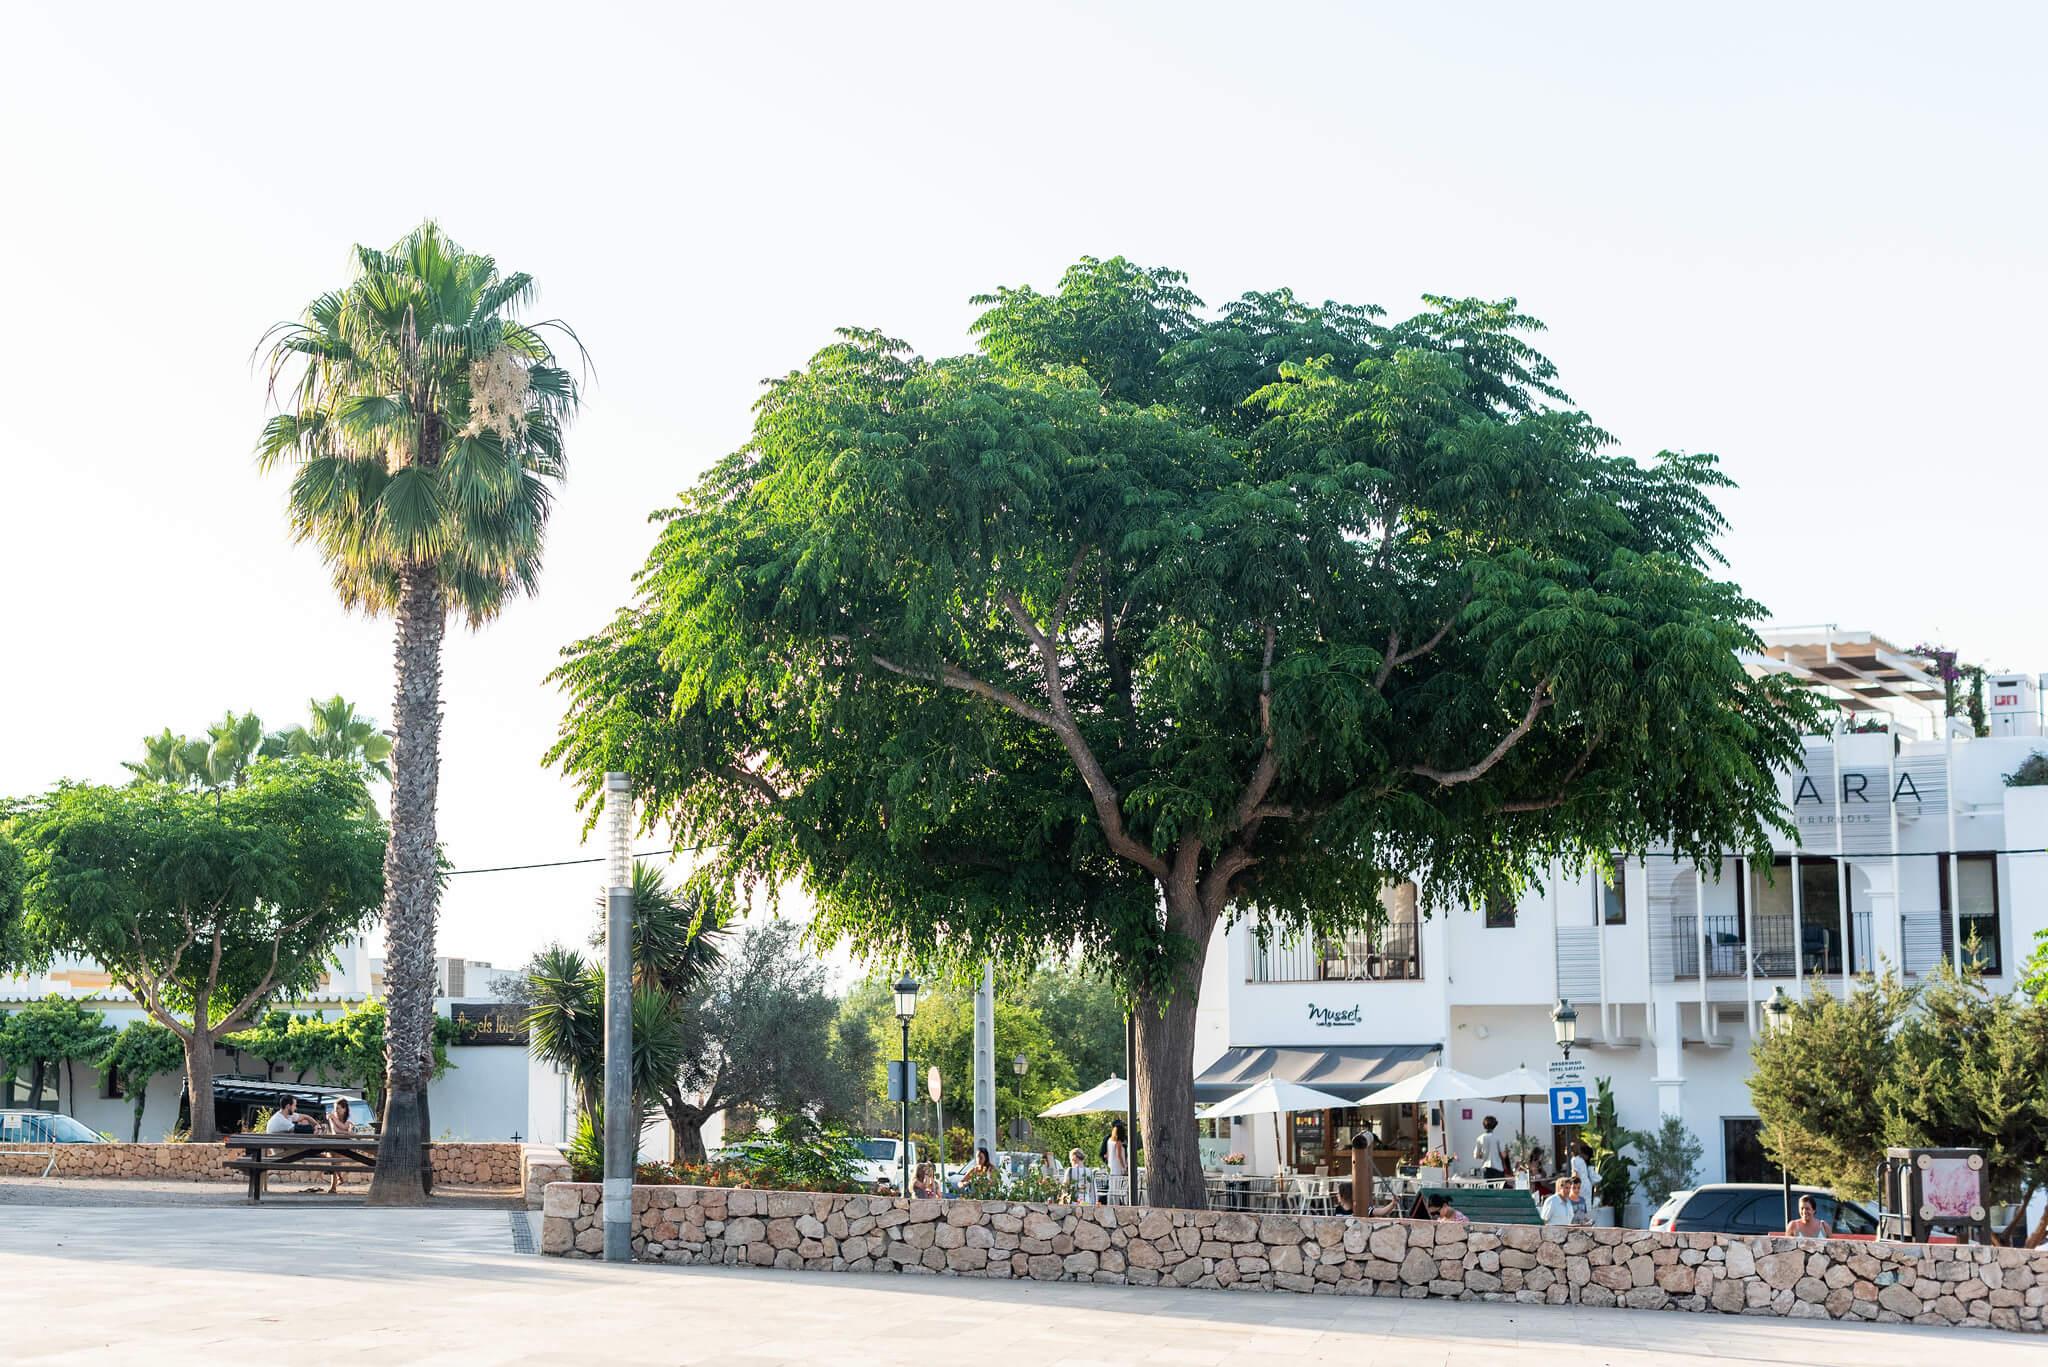 https://www.white-ibiza.com/wp-content/uploads/2020/05/white-ibiza-villas-where-to-stay-santa-gertrudis-07.jpg